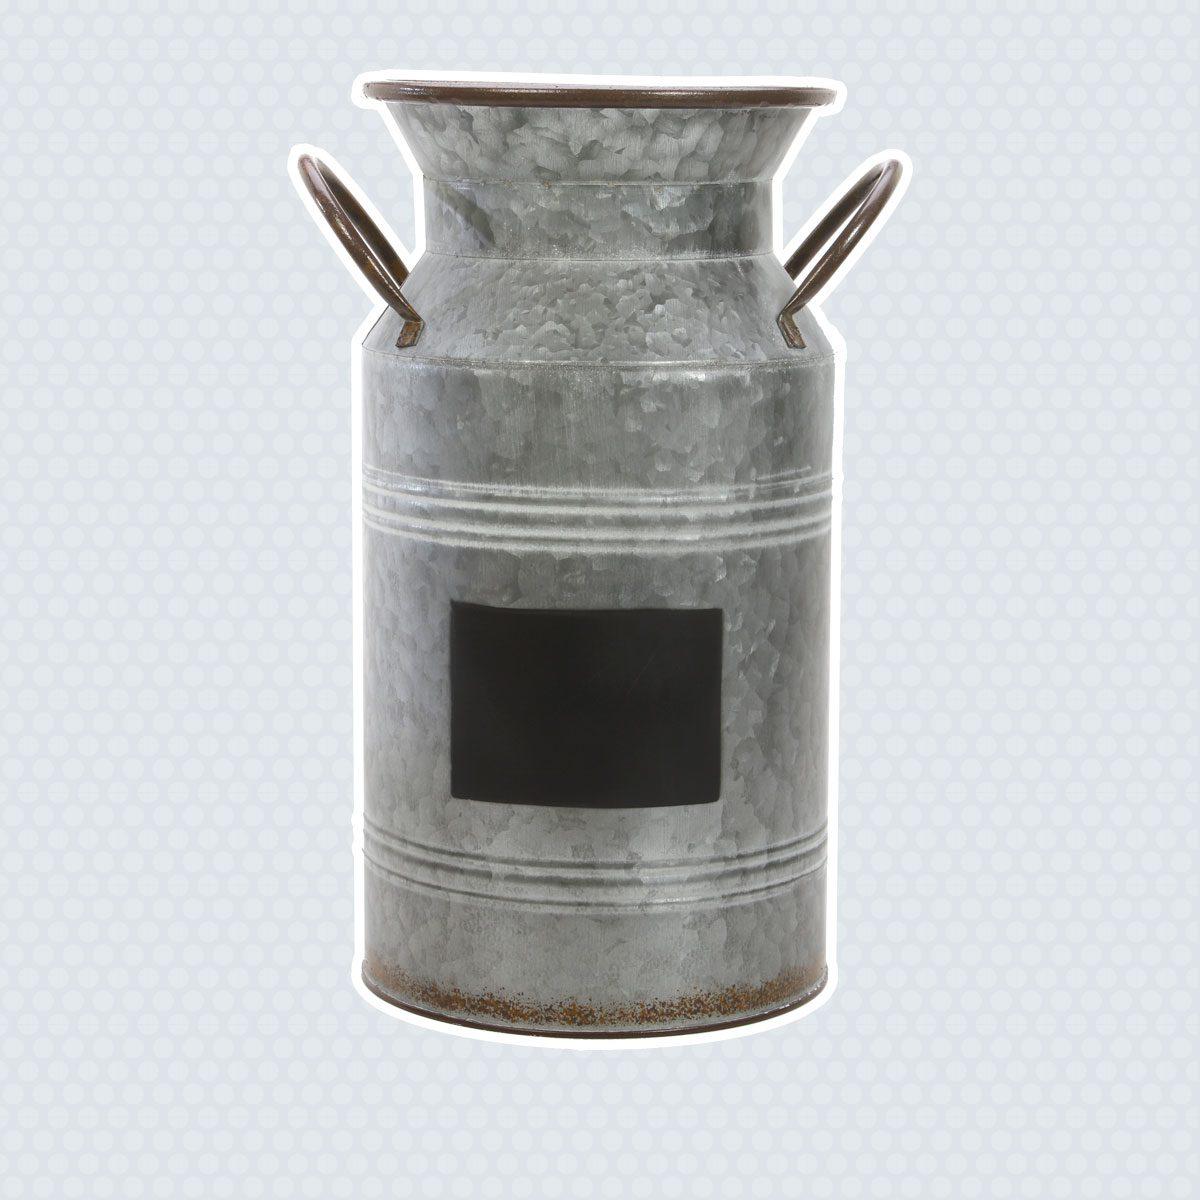 Metal Milk Jug